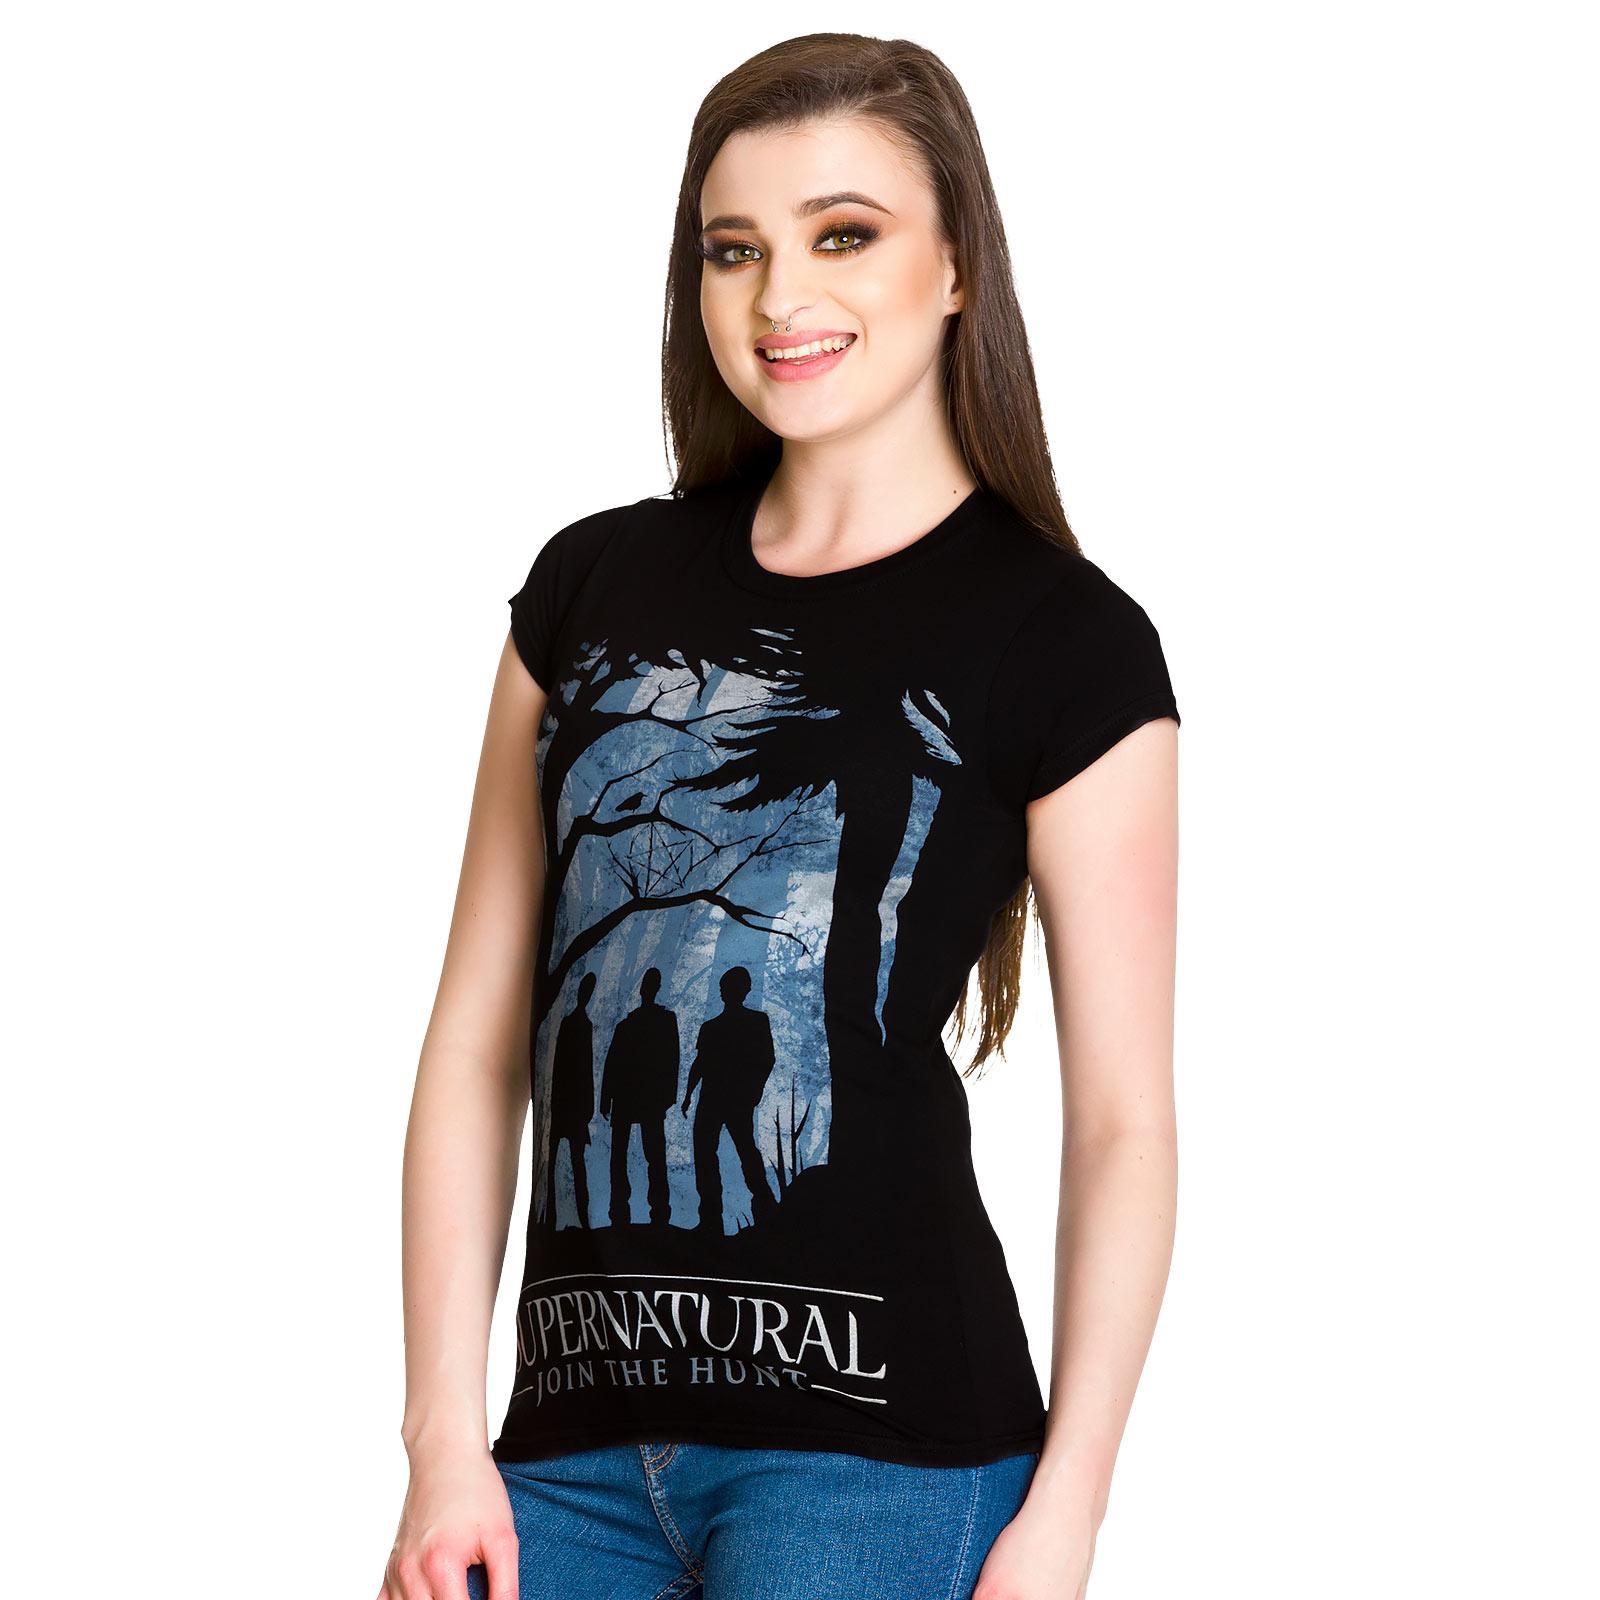 Supernatural - Demon Hunters Girlie Shirt schwarz